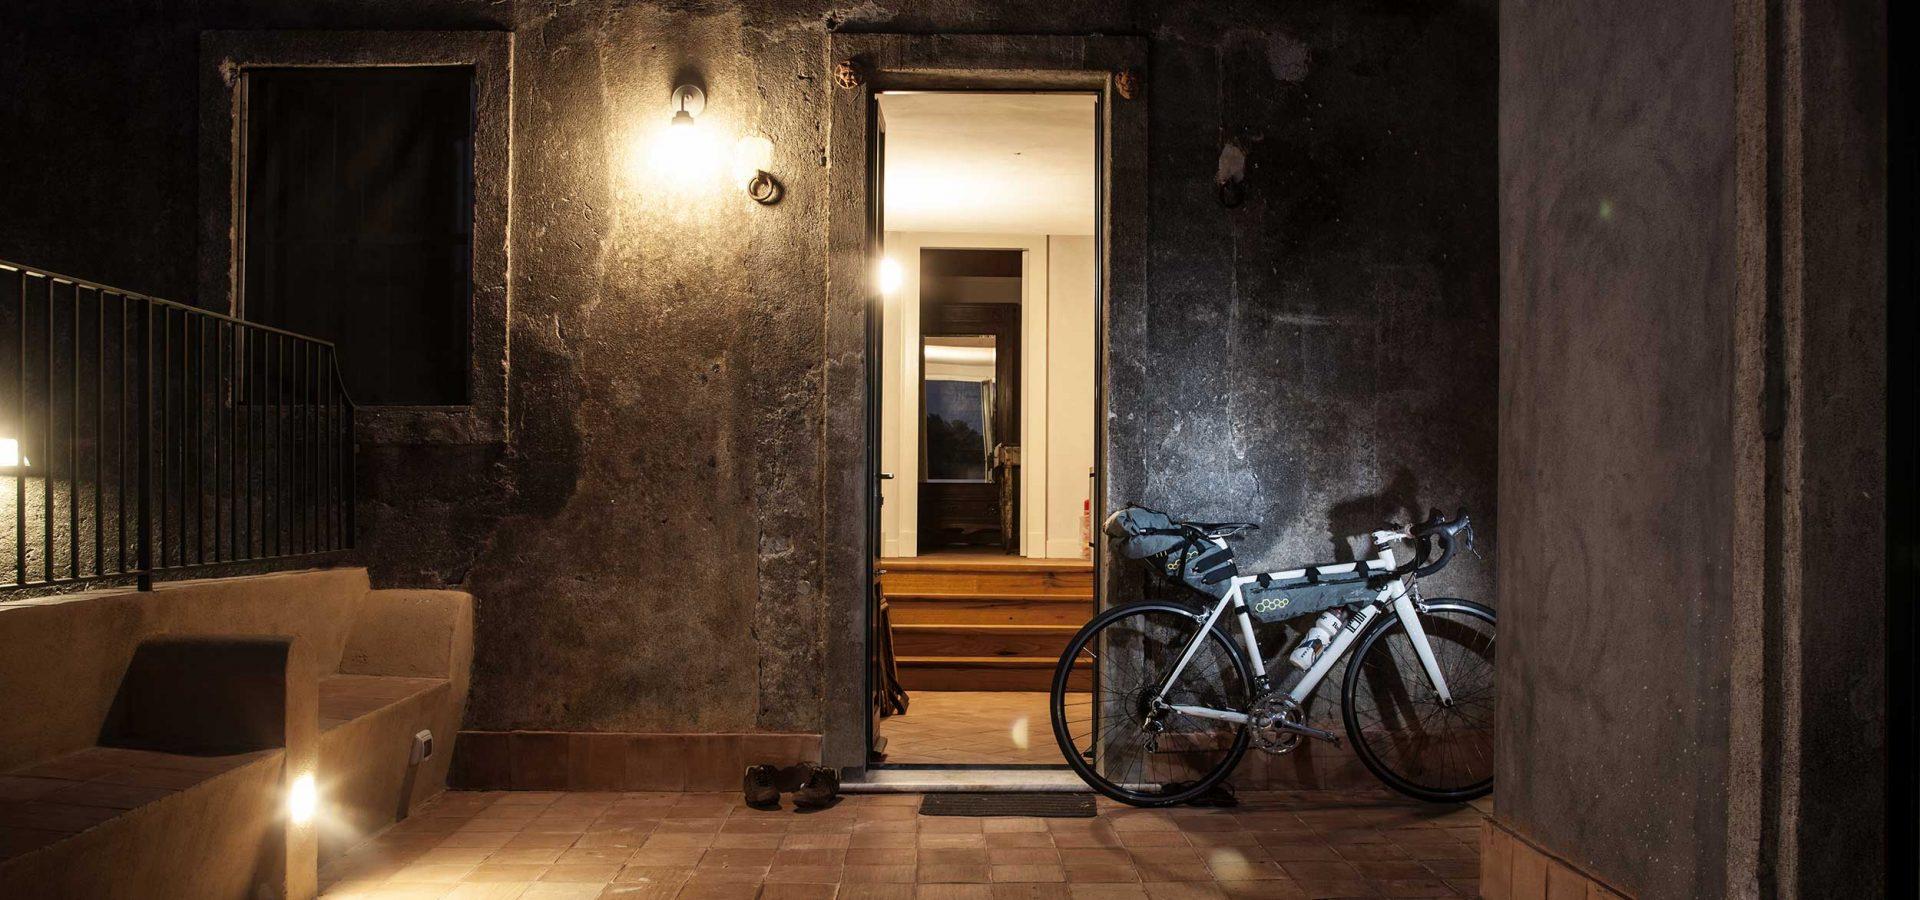 Warm Showers free hospitality exchange cycling community